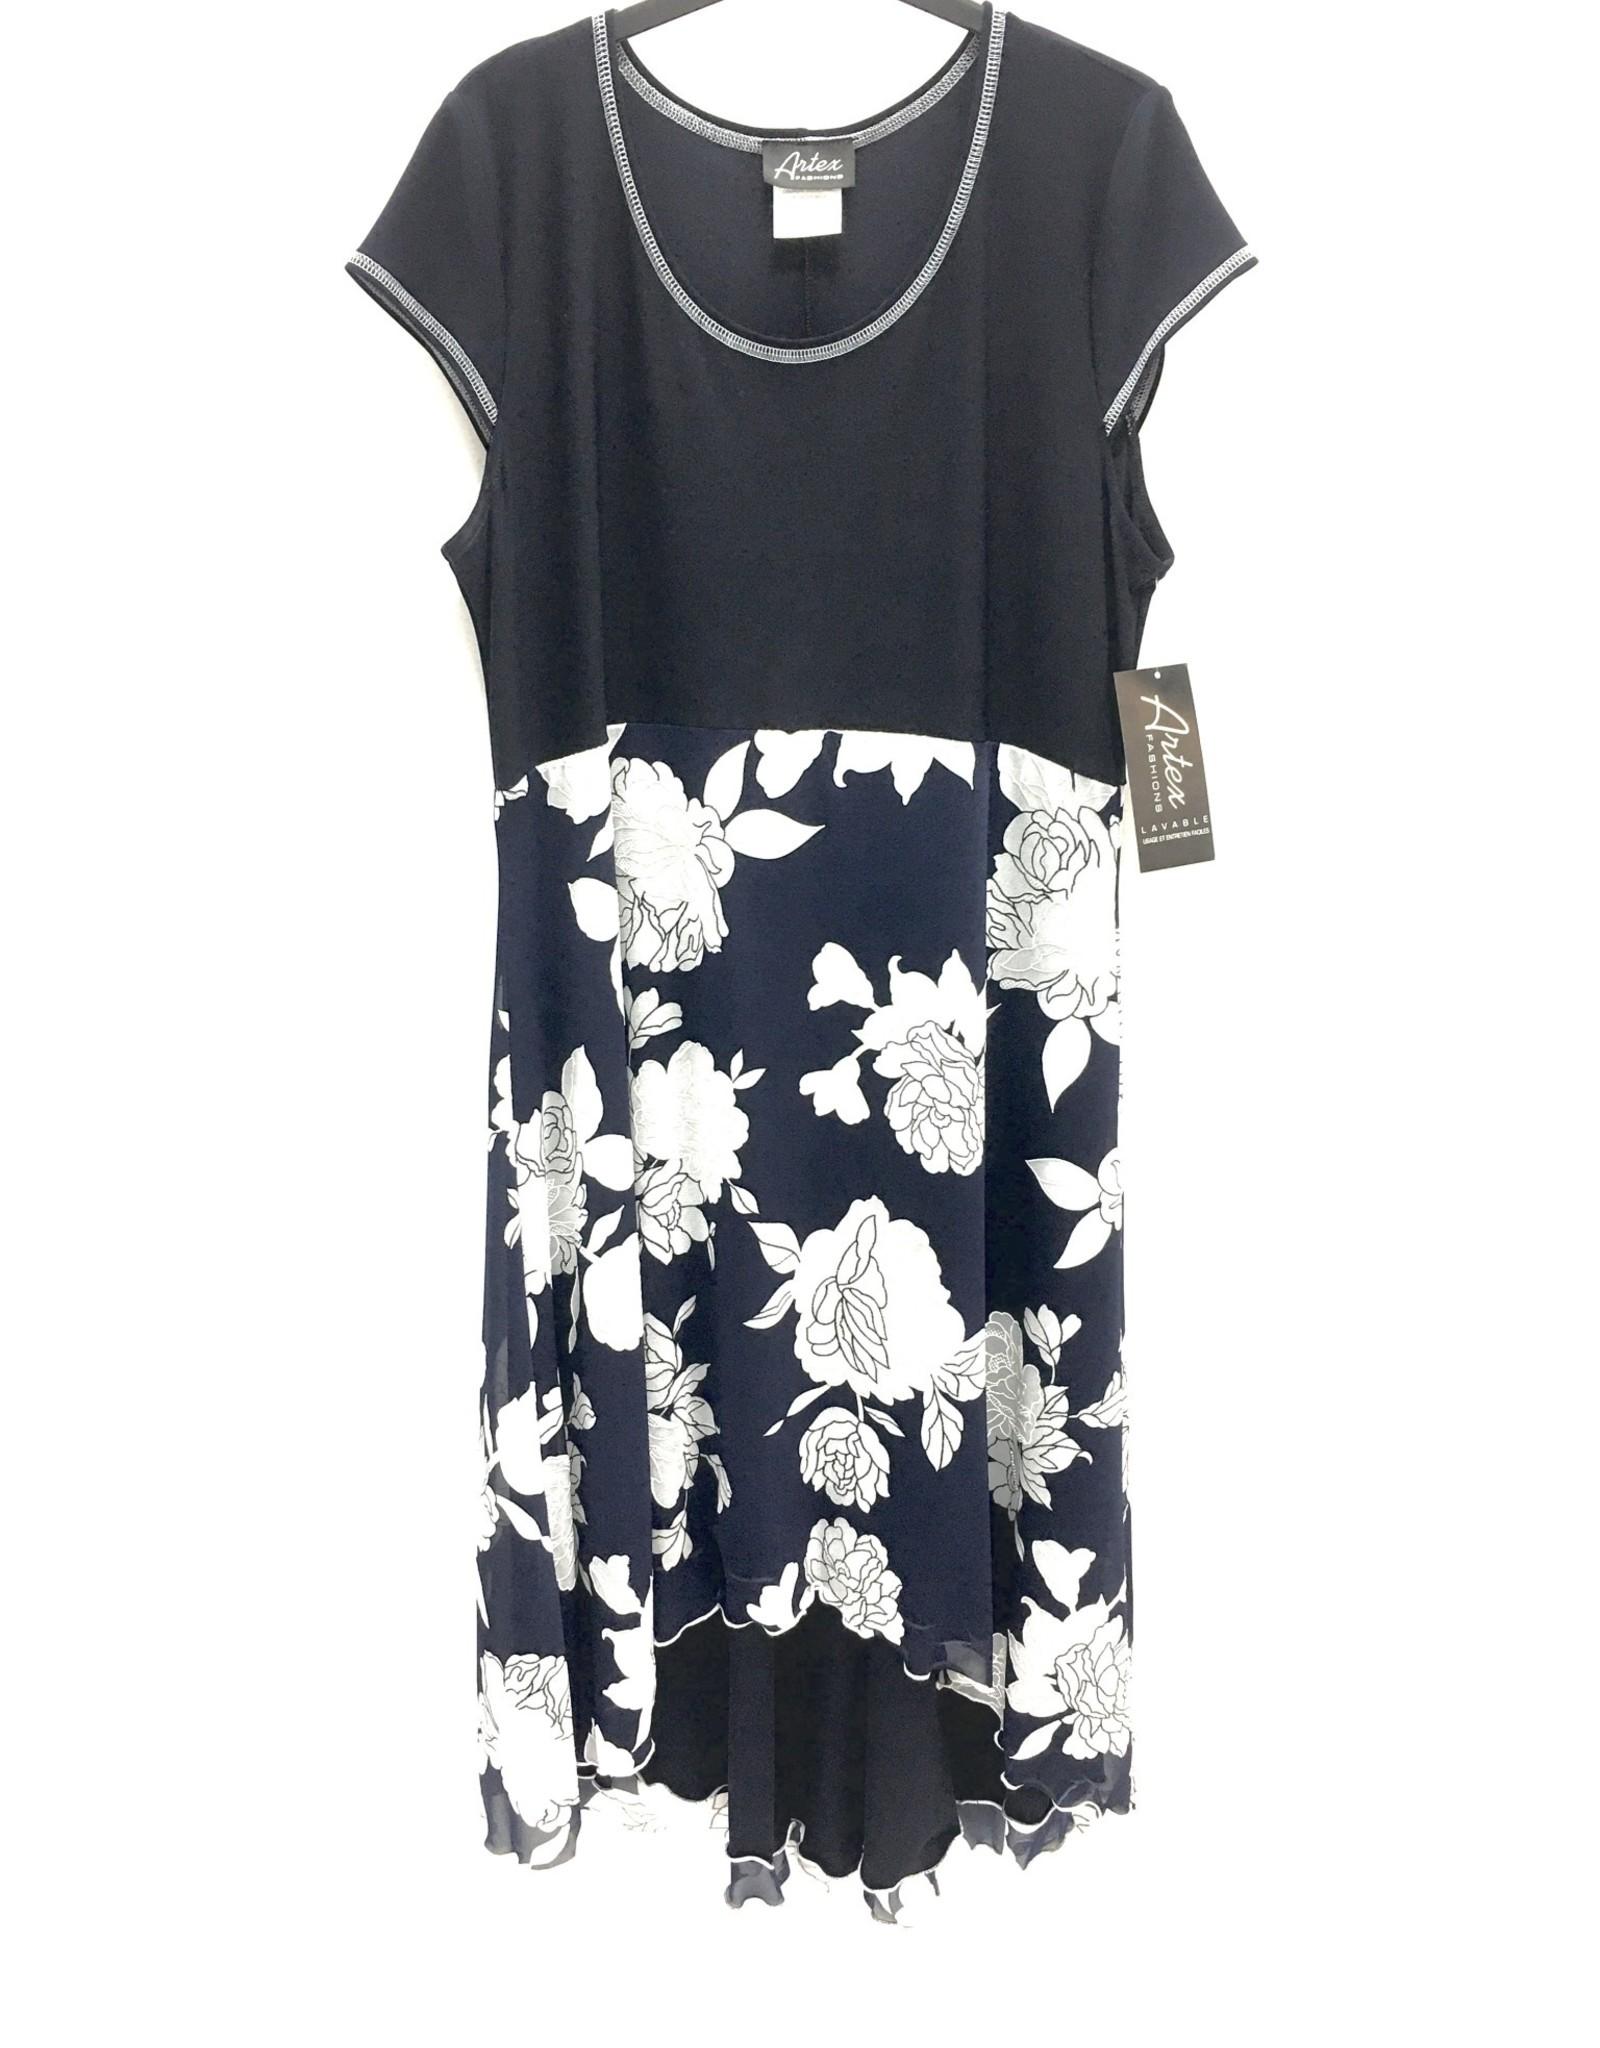 Artex ARTEX Dress 33-6115